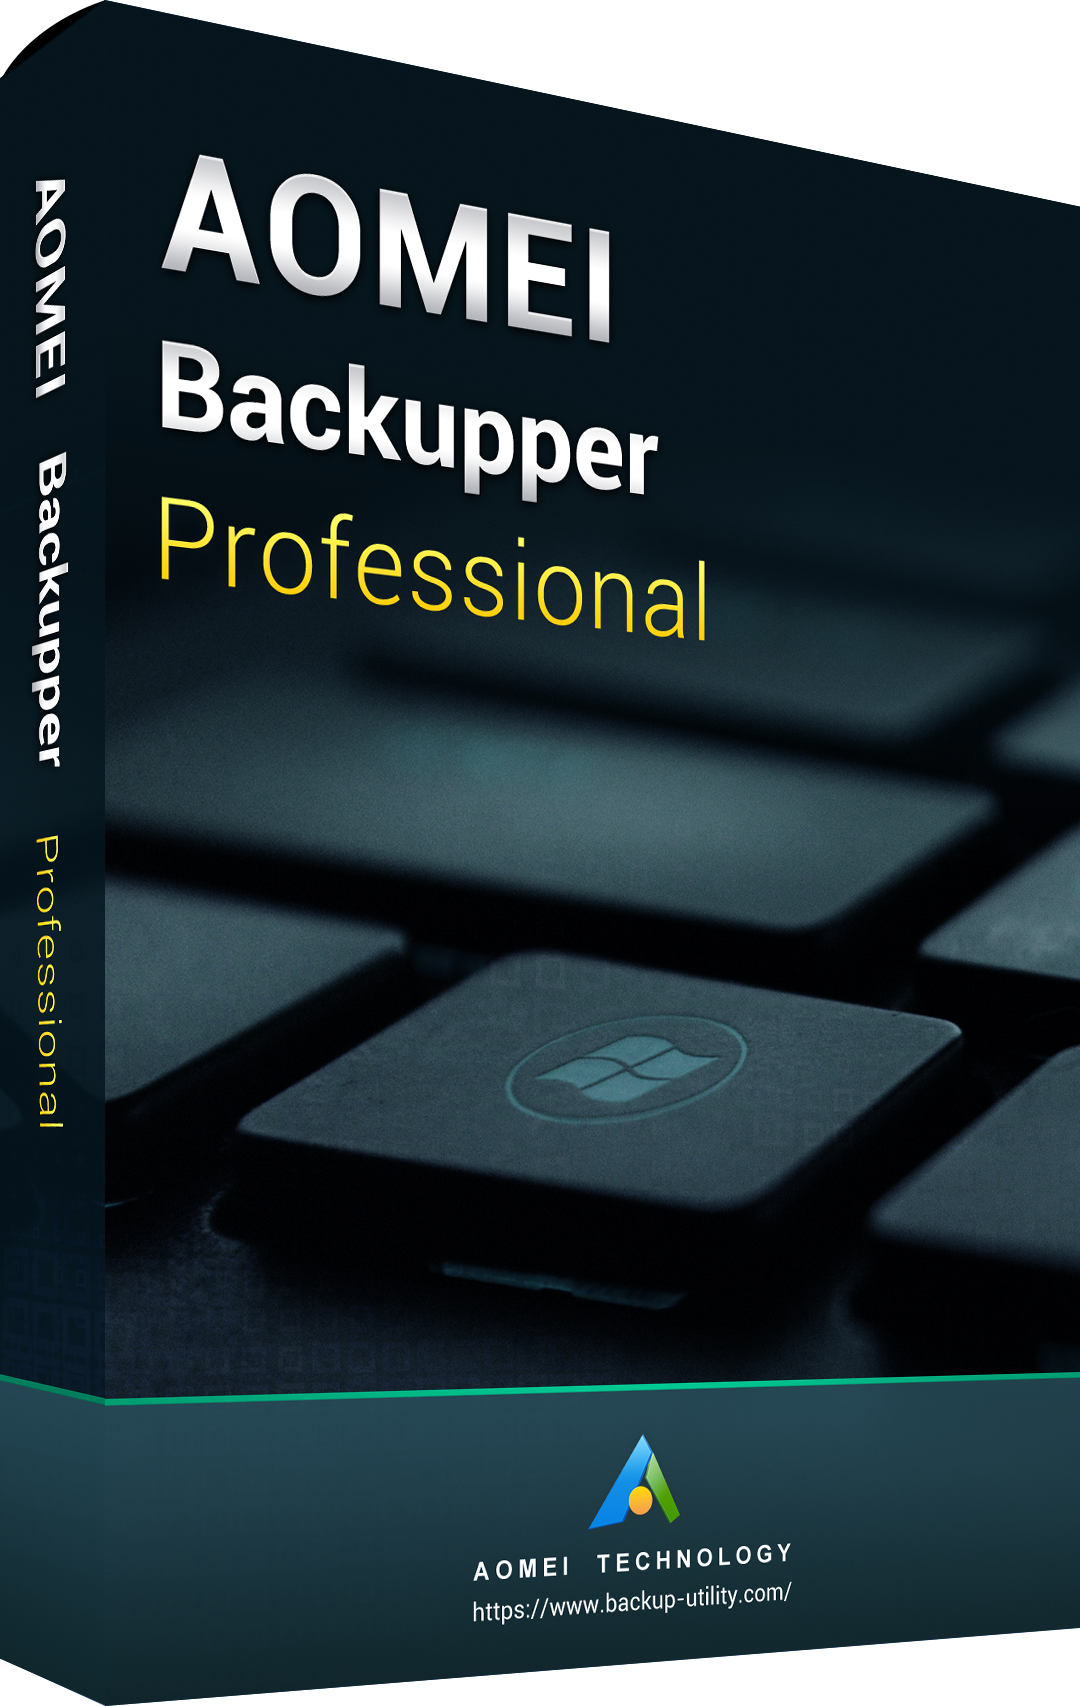 AOMEI Backupper Professional Edition 365 Days 5.7 Key Global